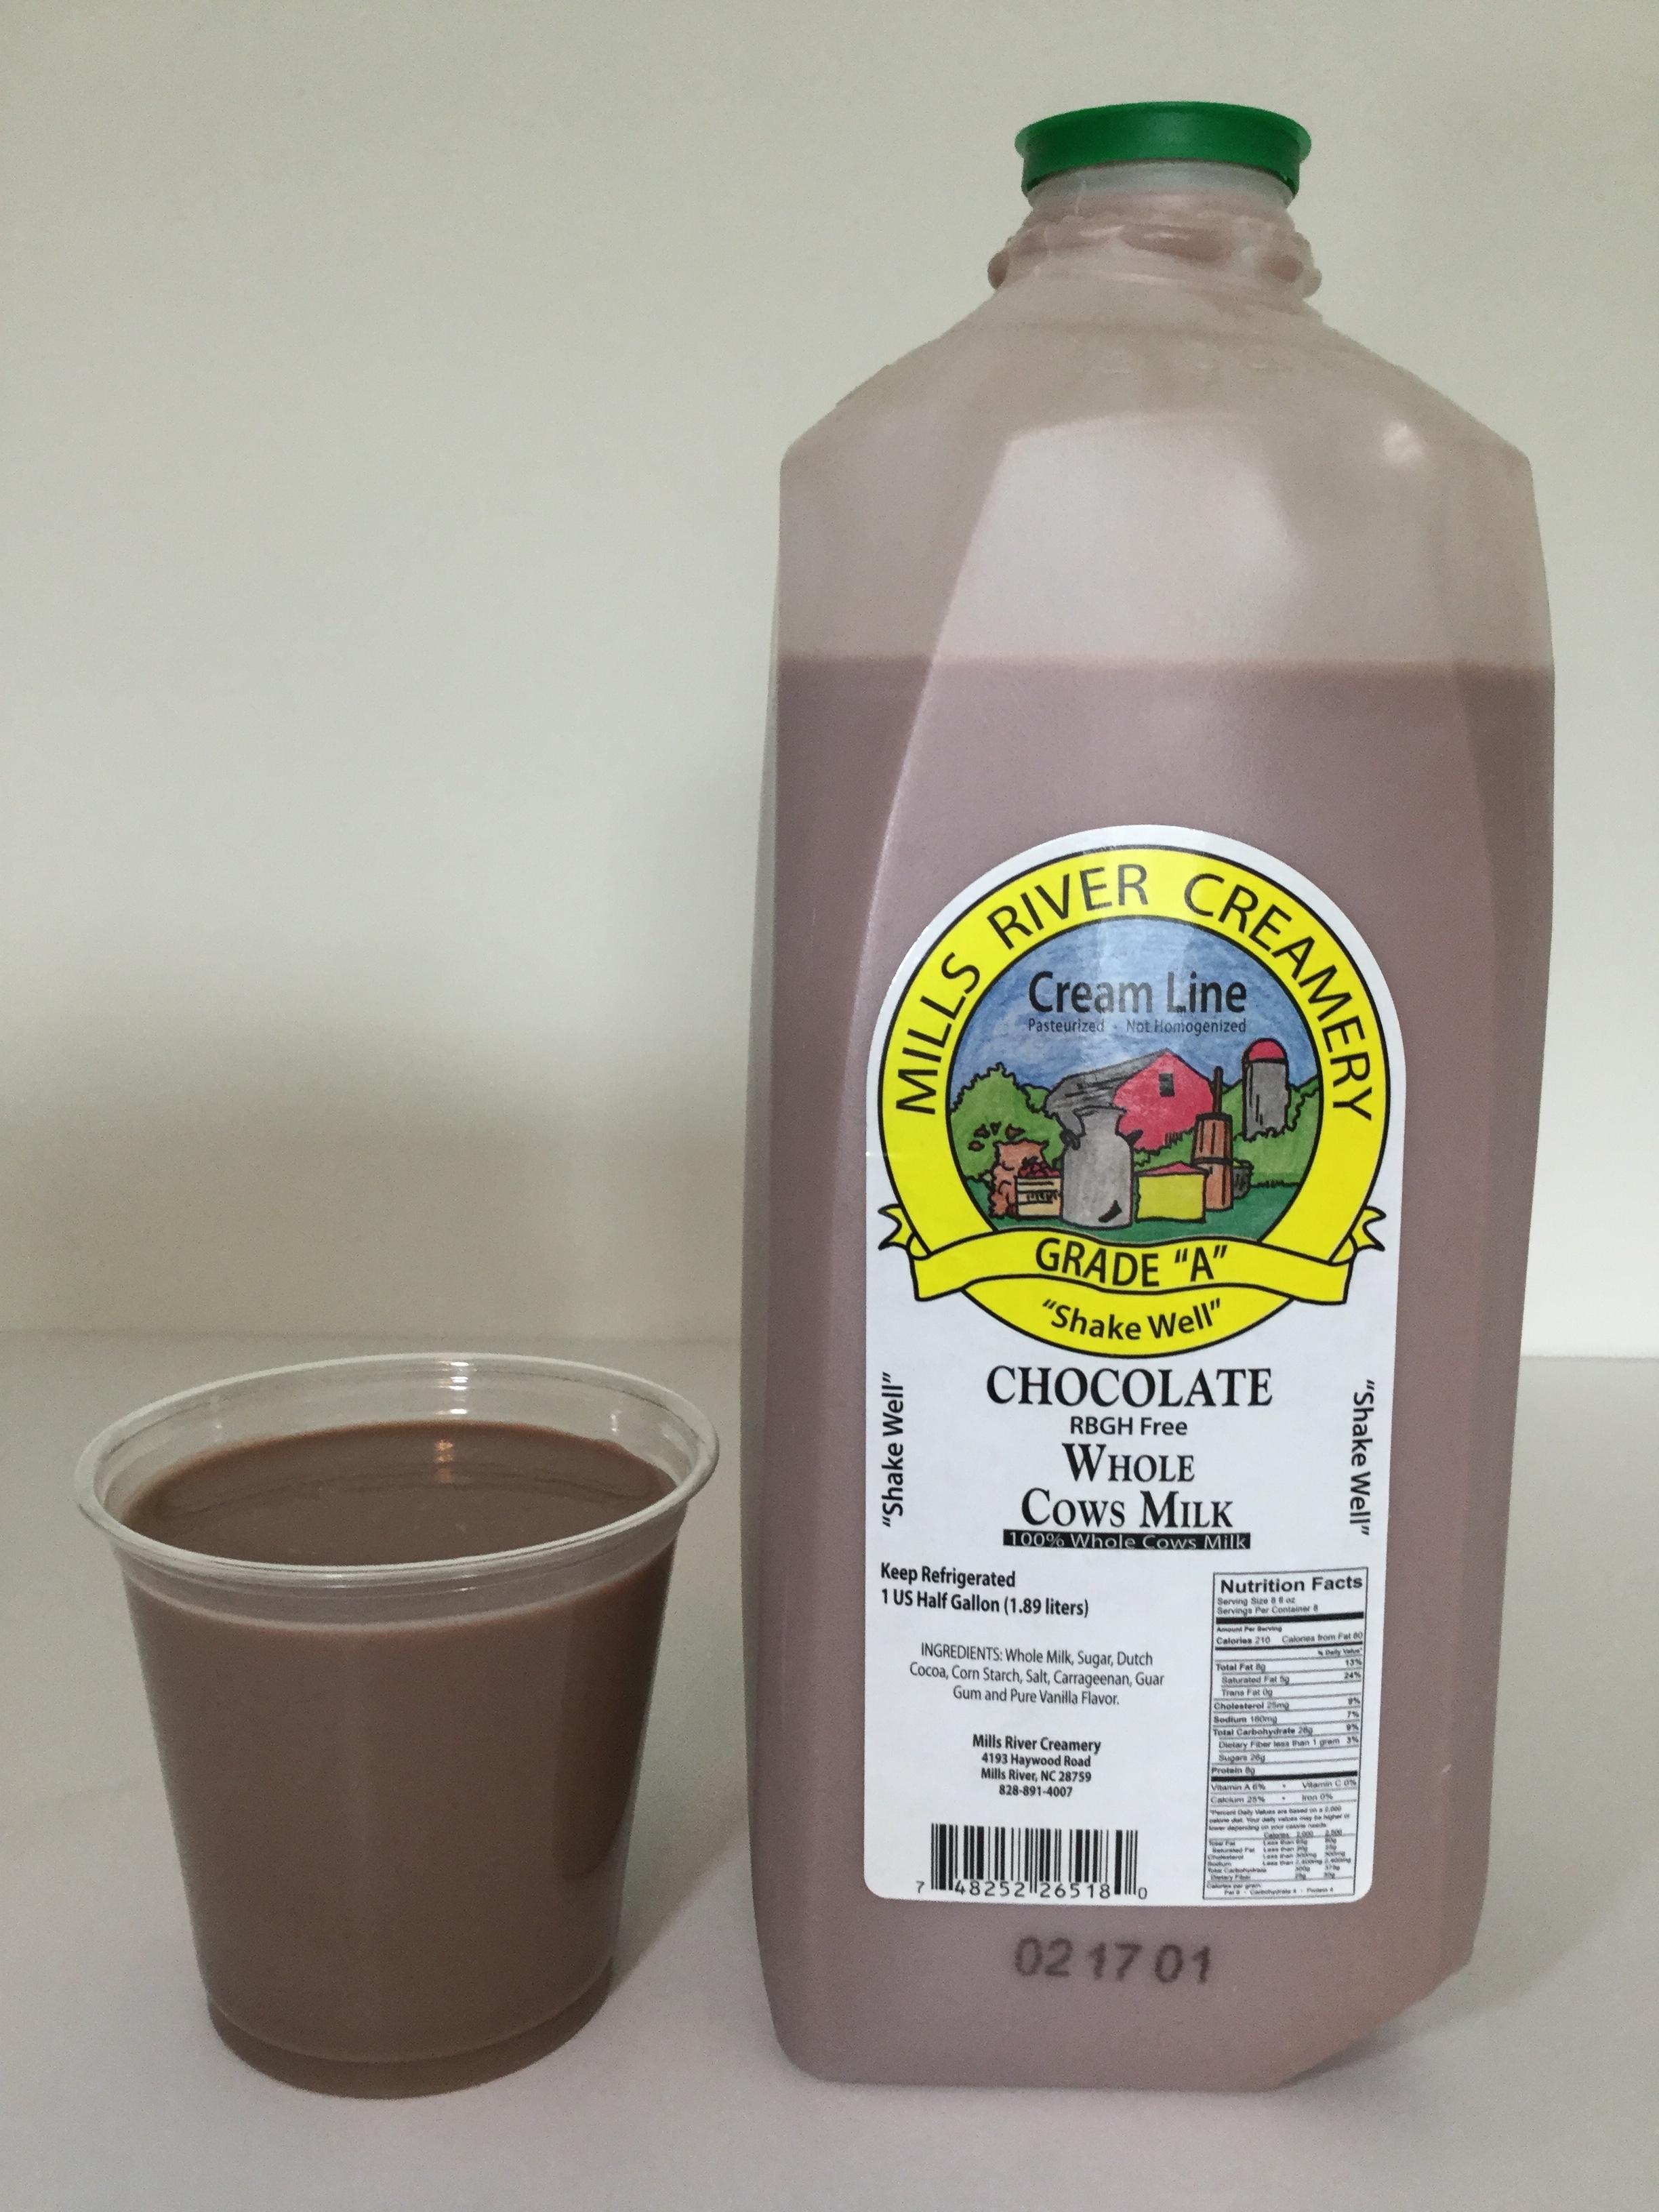 Mills River Creamery Chocolate Milk Cup2